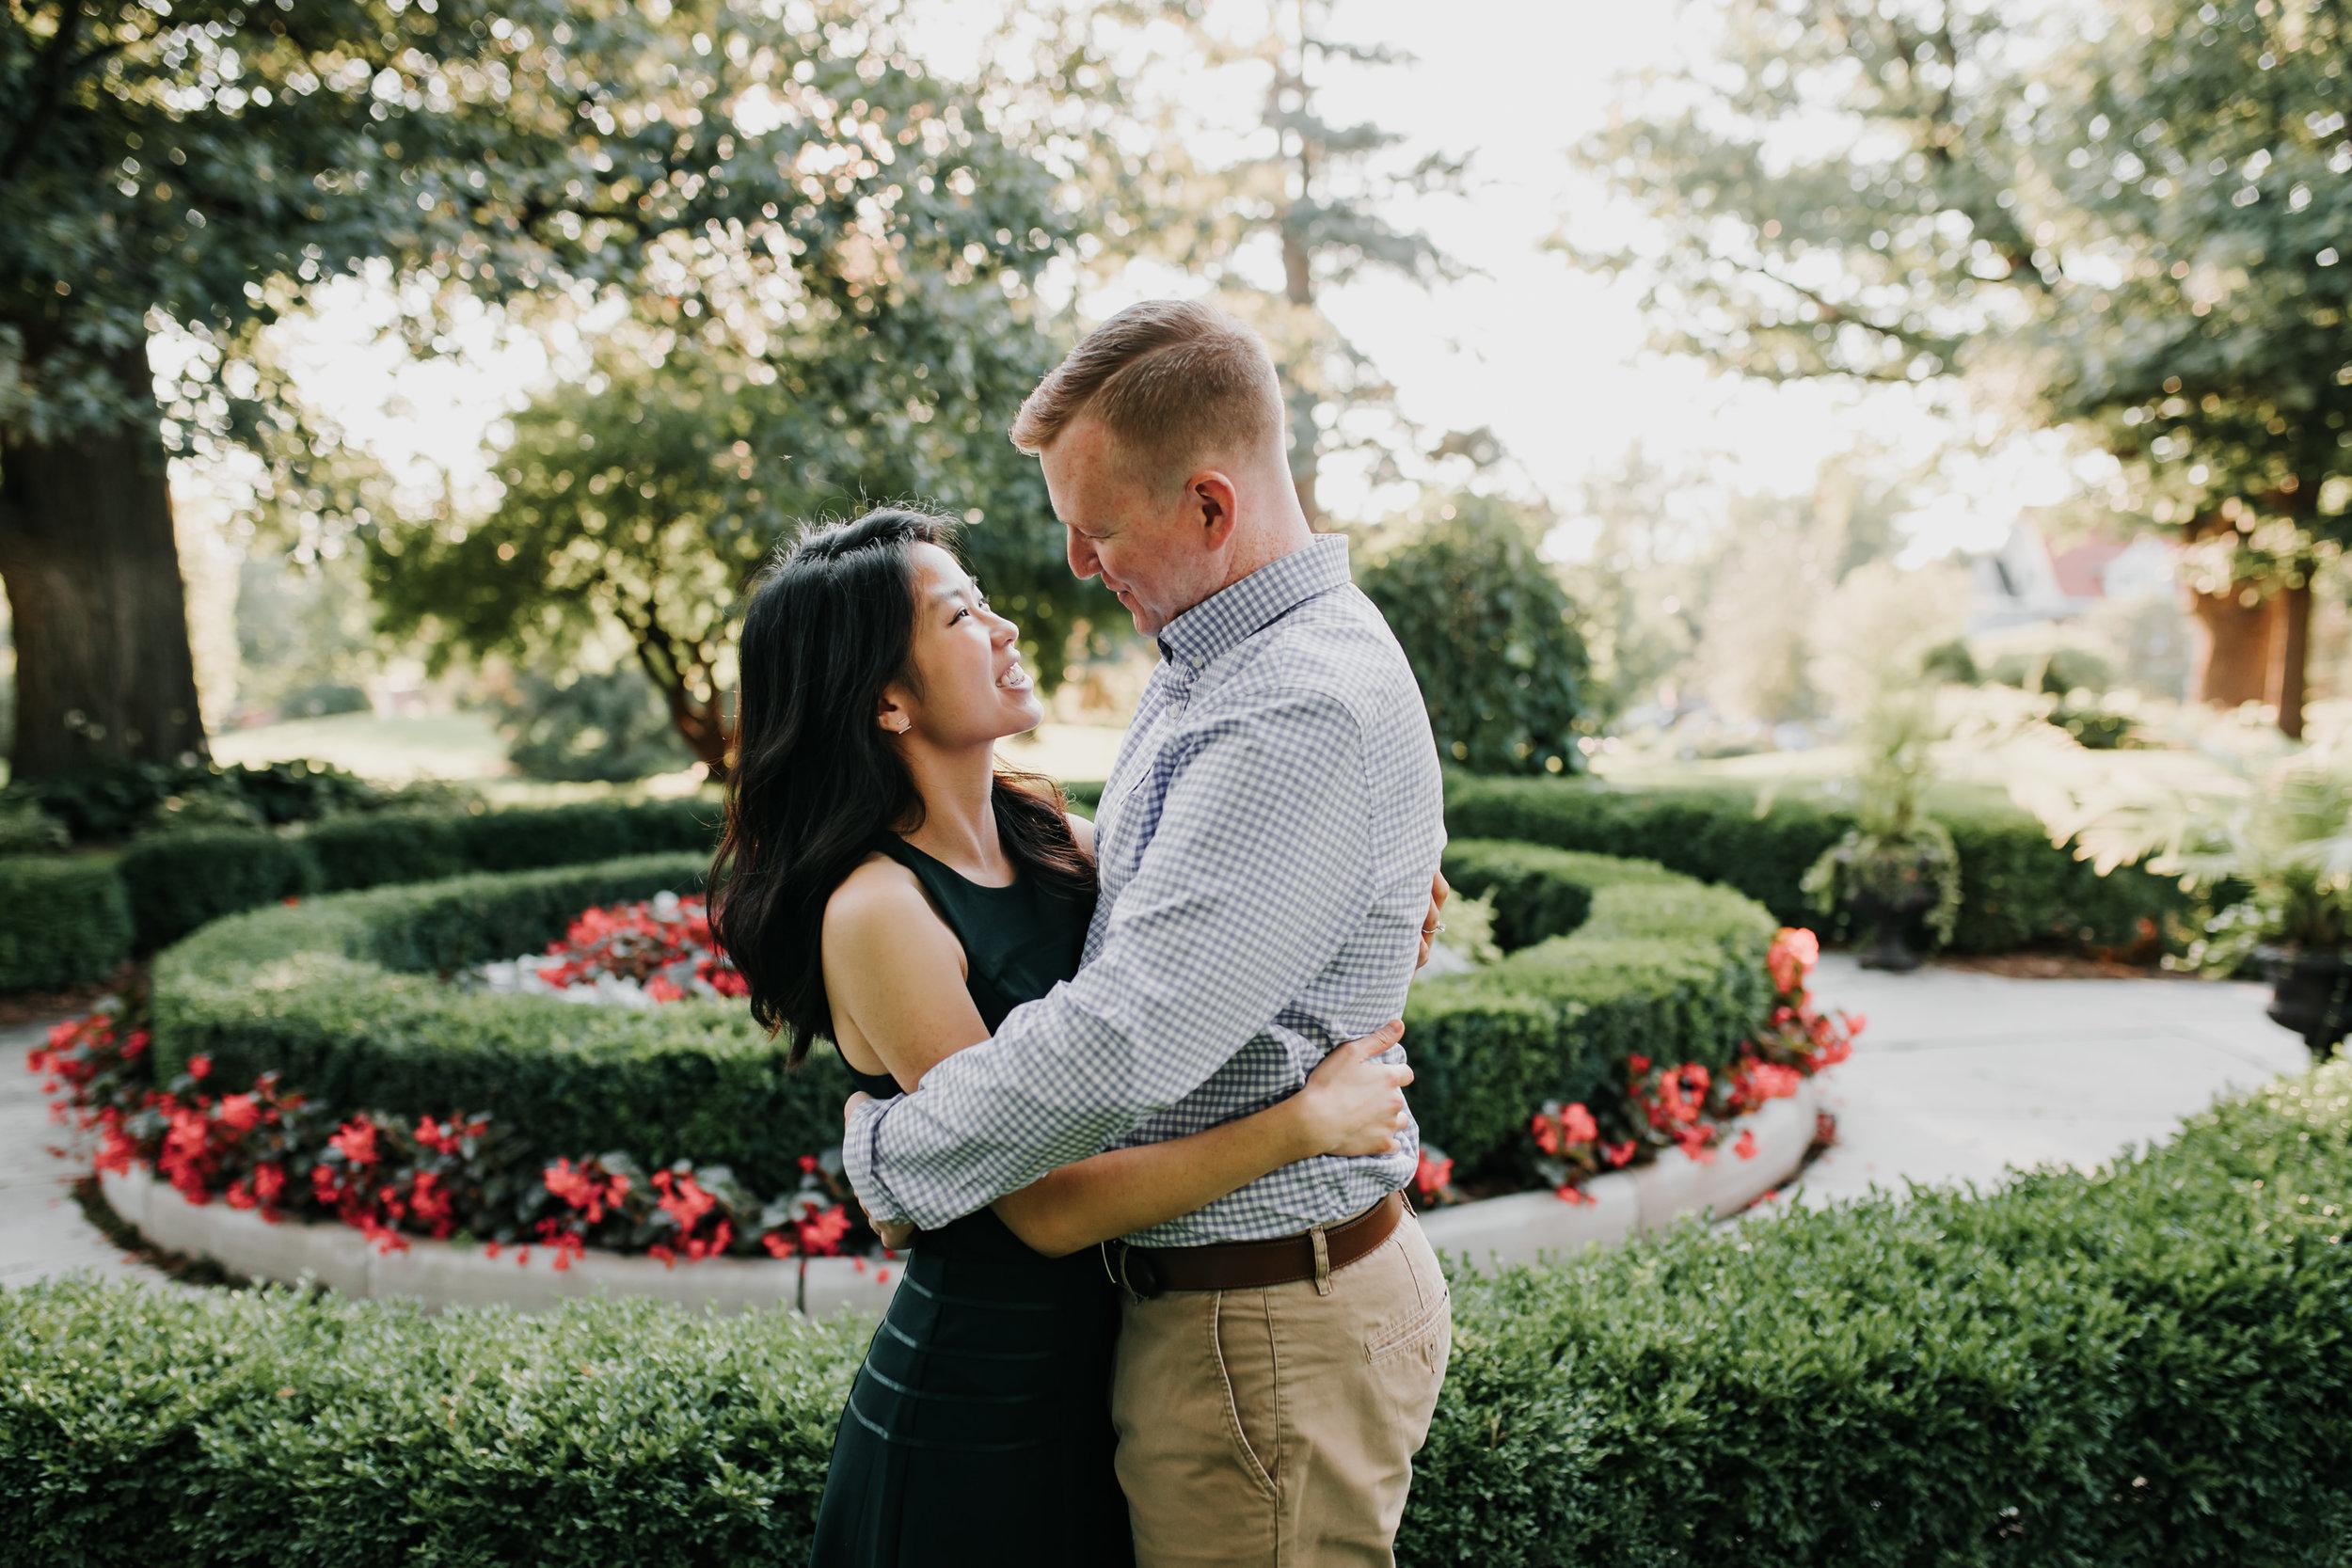 Catherin & Kyle - Married - Nathaniel Jensen Photography - Omaha Nebraska Wedding Photograper - Memorial Park - Joslyn Castle Engagement Session-32.jpg